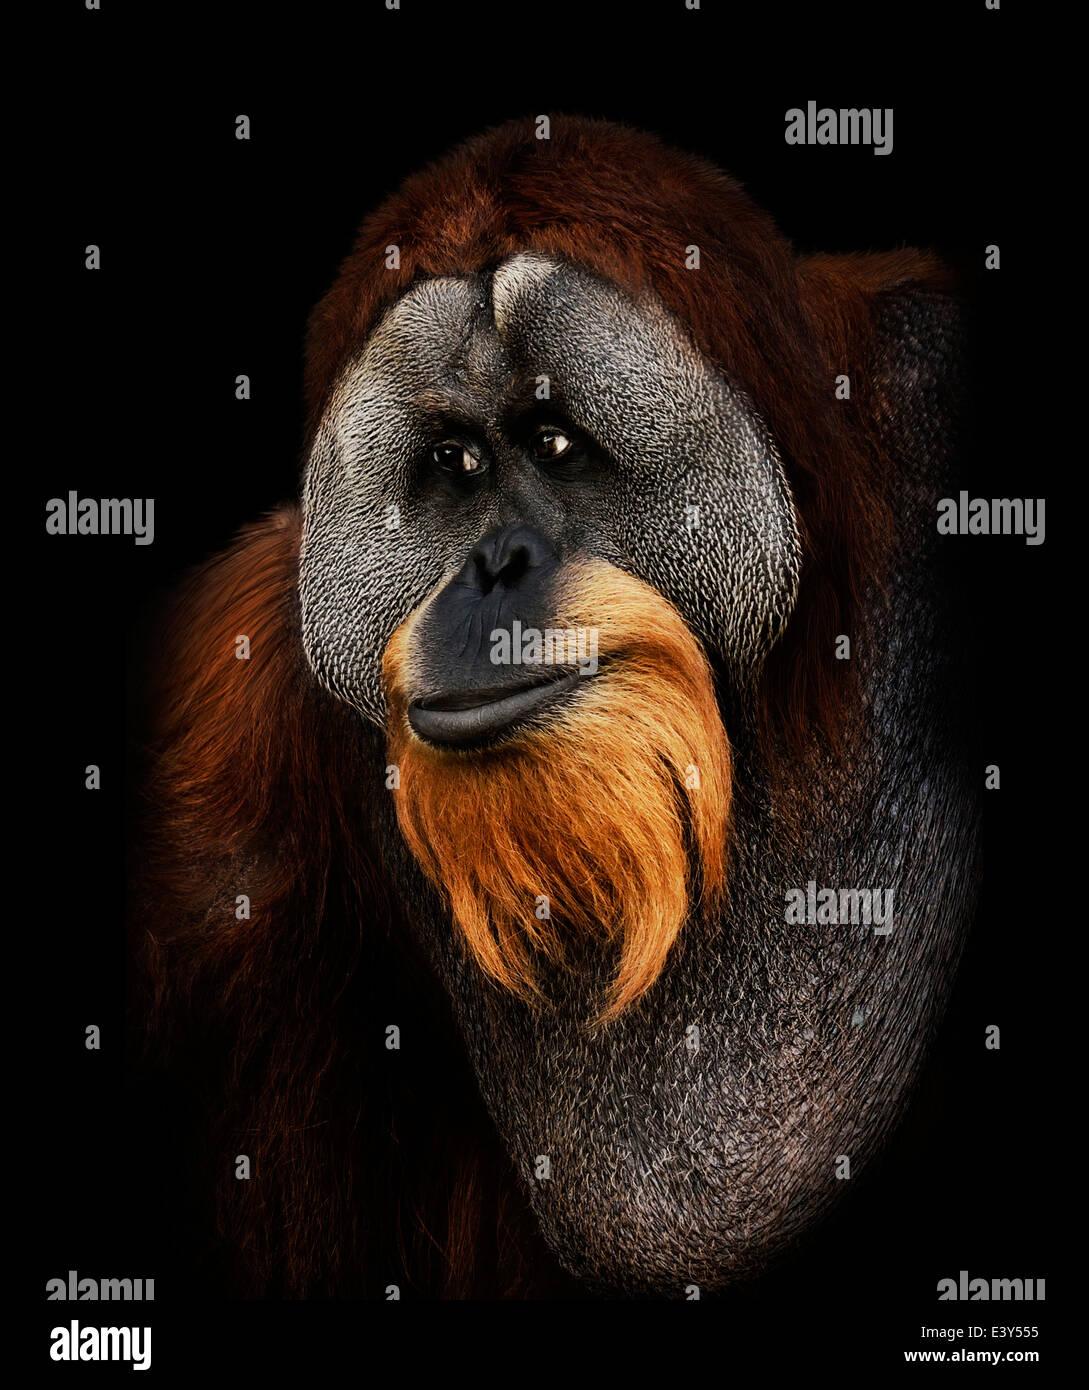 Orangutan Portrait On Black Background - Stock Image